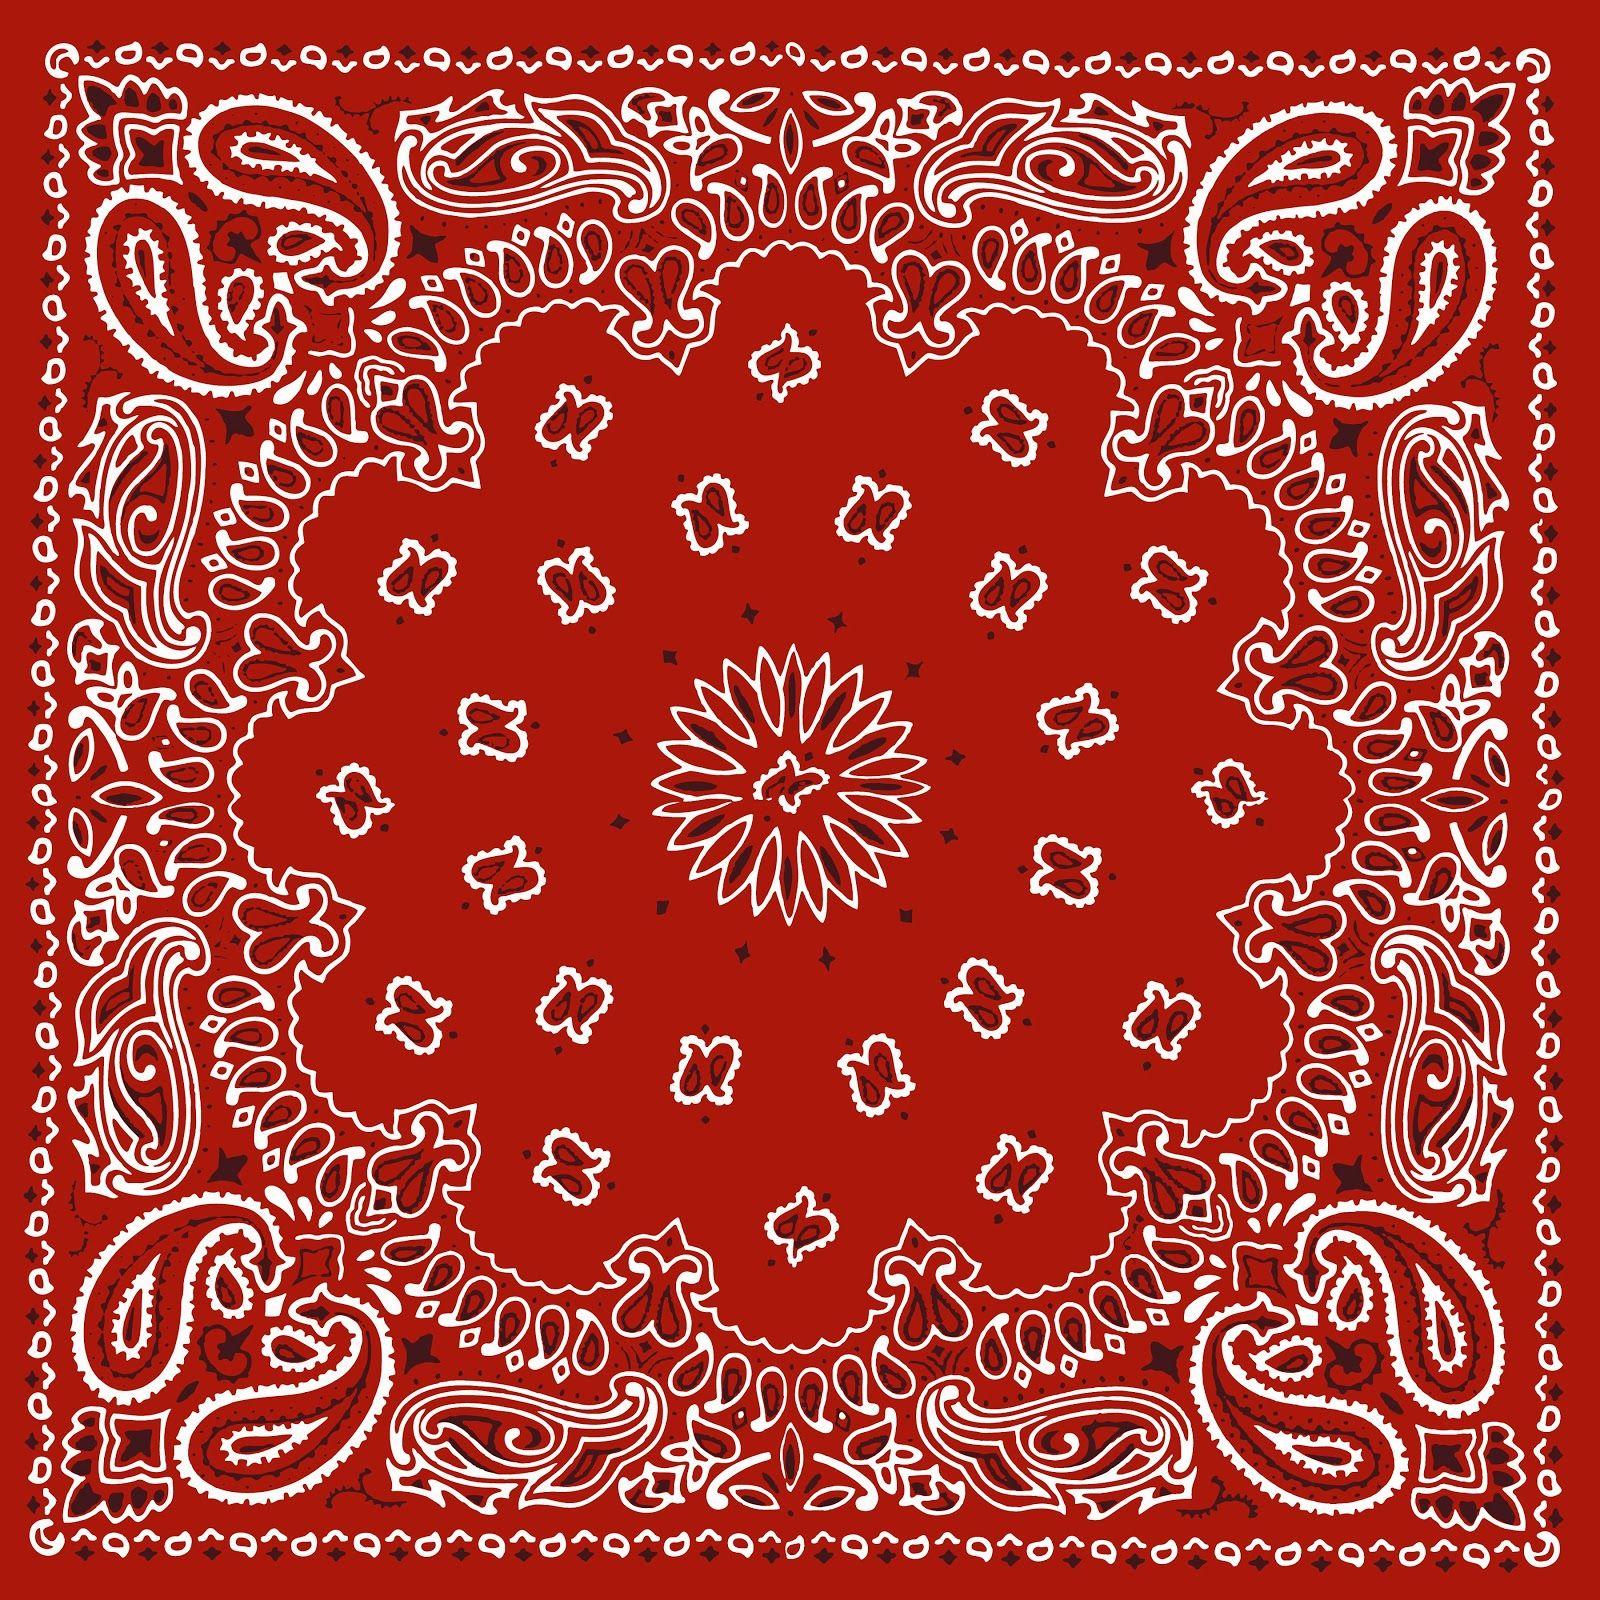 RED BANDANA, PRINTABLE BACKGROUND.